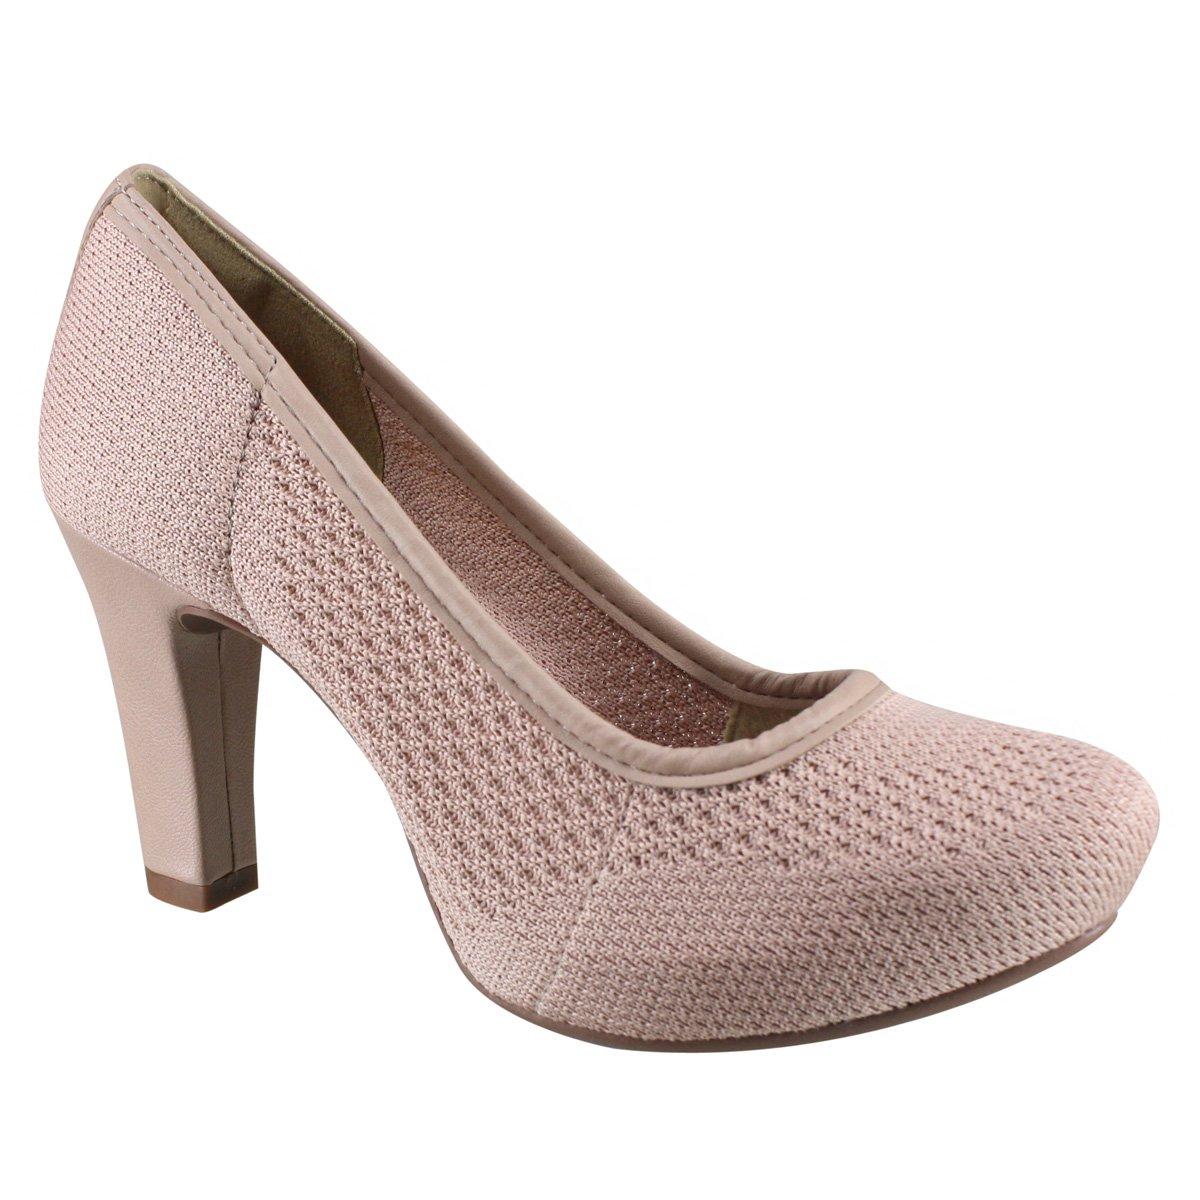 0cf023a28 Sapato Feminino Dakota Meia Pata B9861 0001 - Nude (Malha) - Botas ...